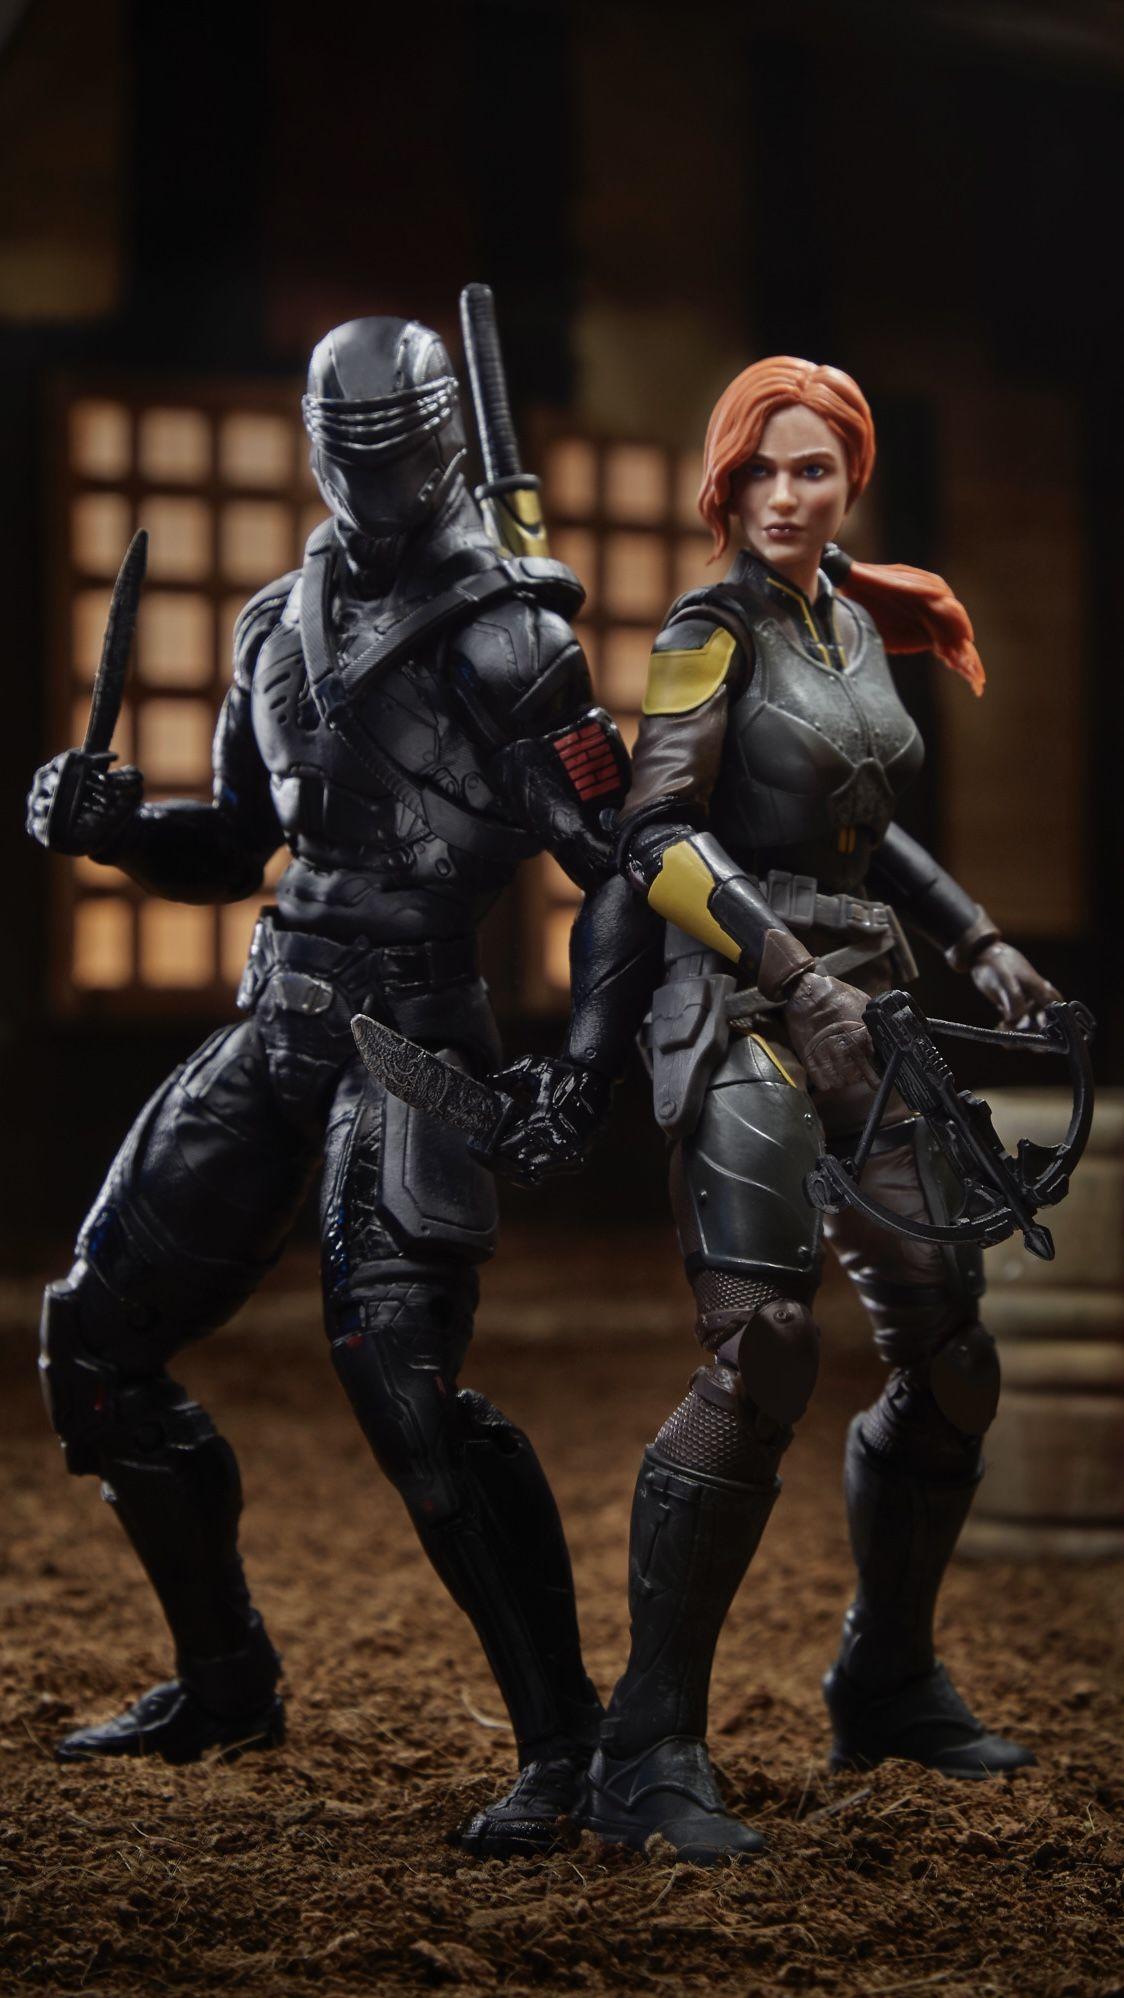 Snake Eyes and Scarlett action figure